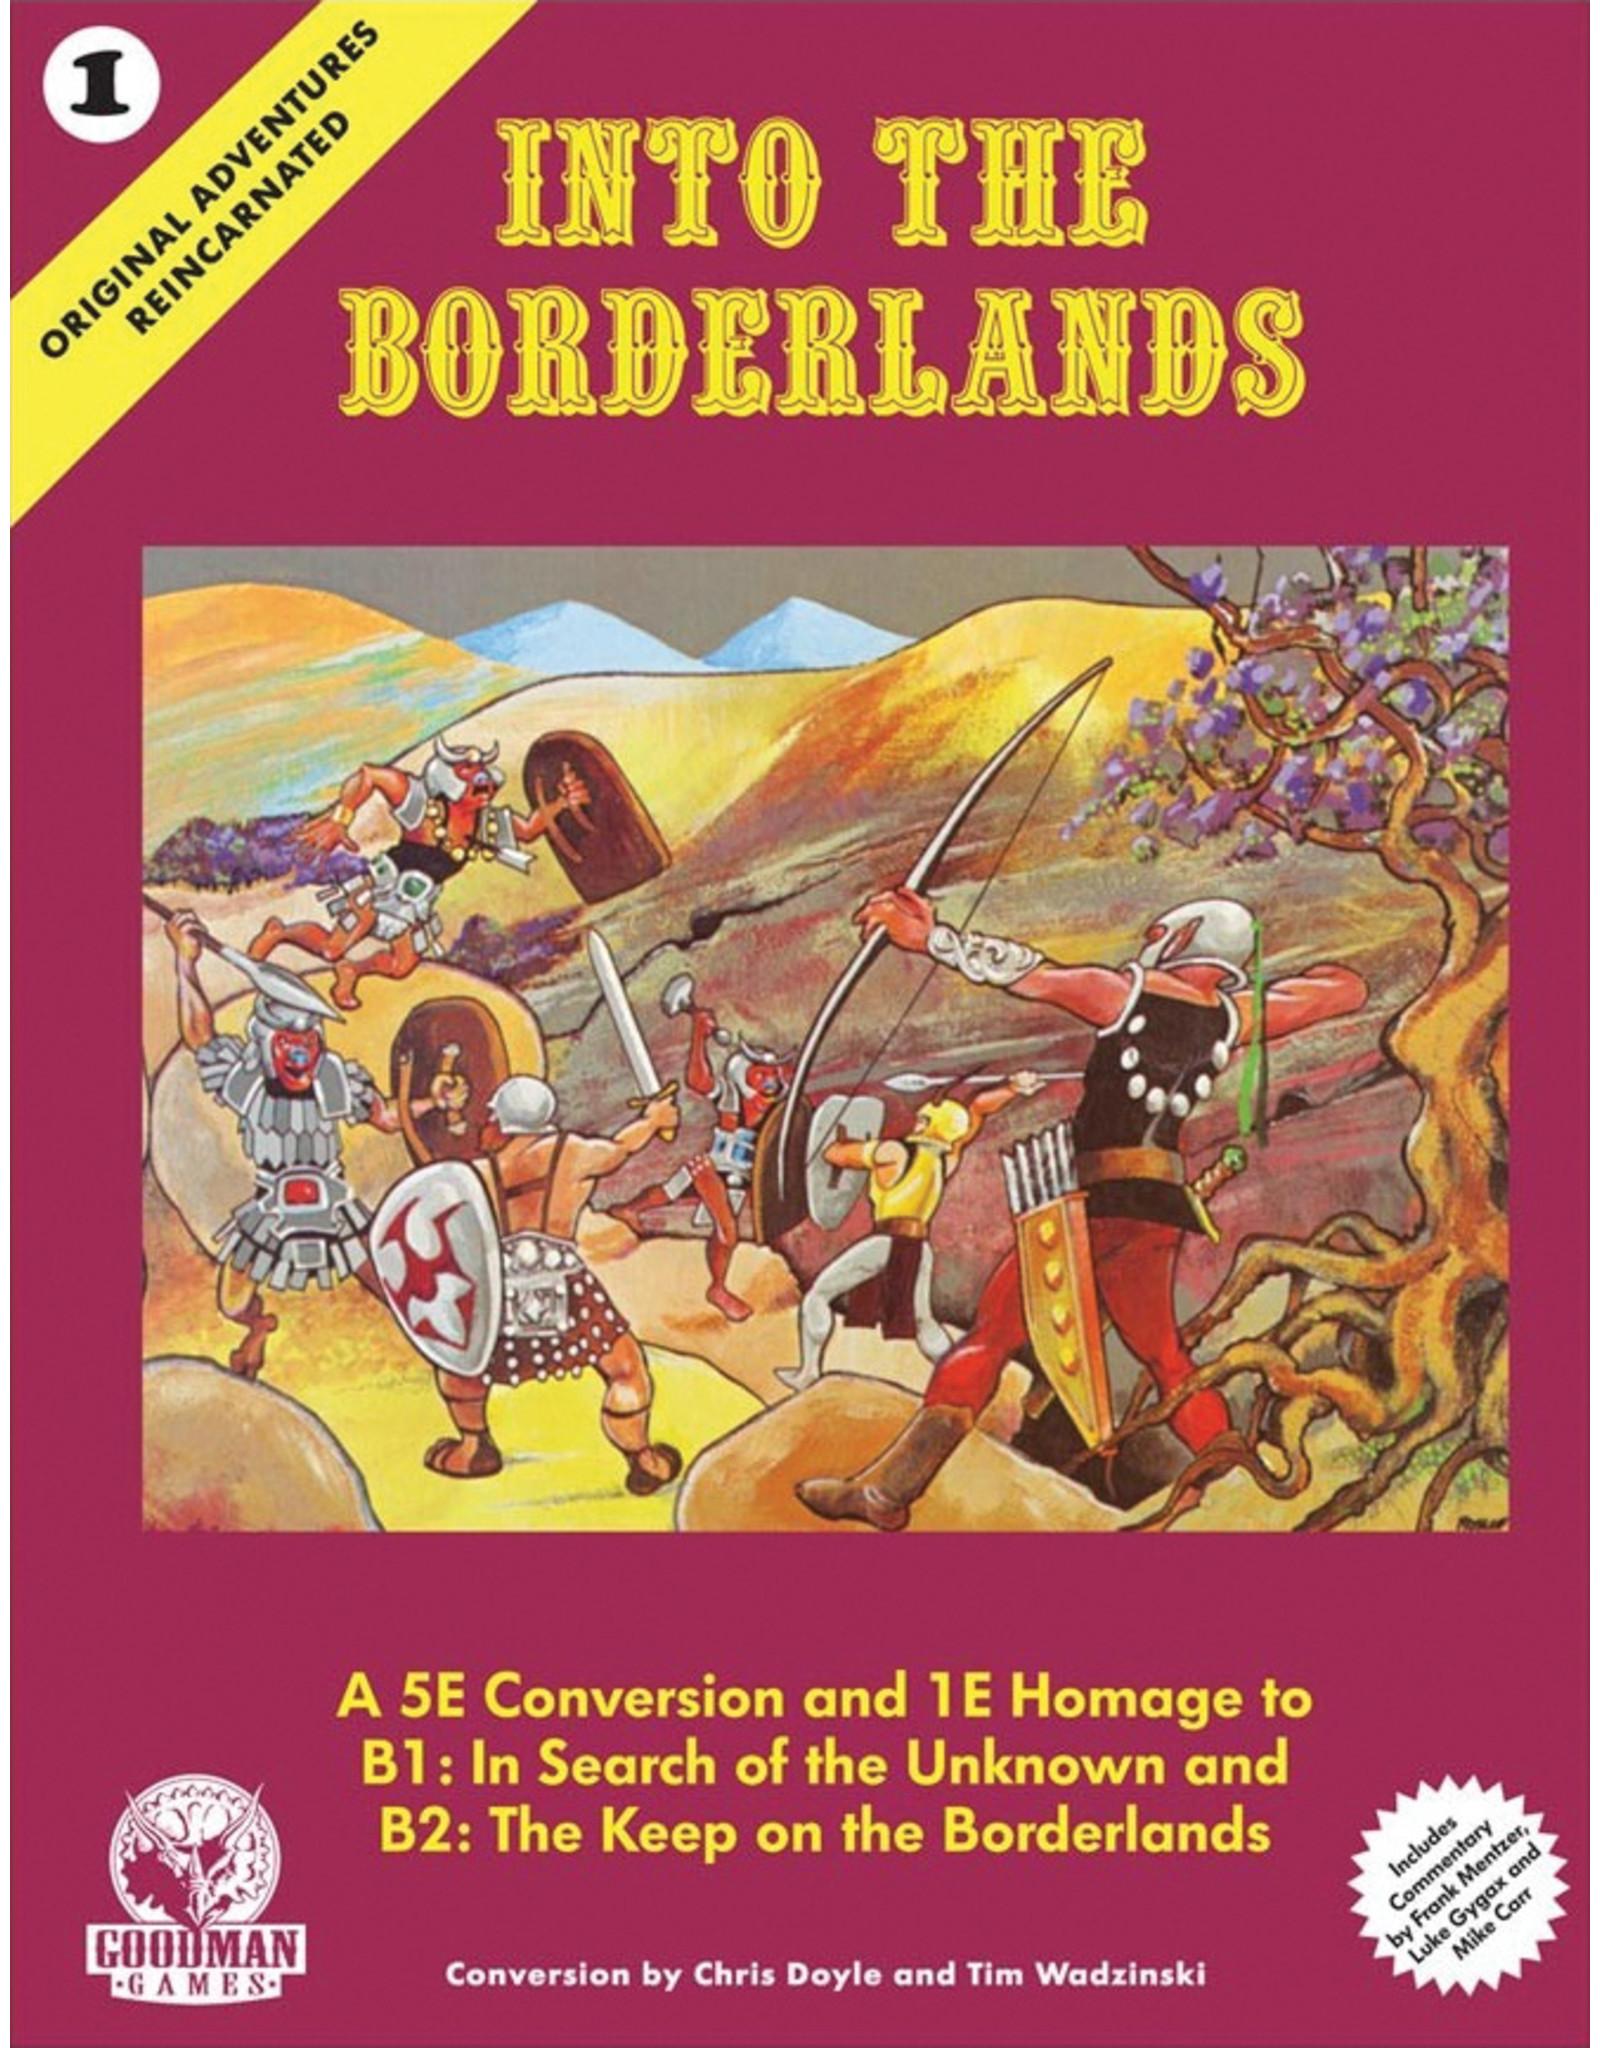 Goodman Games 5E: OAR 1: Into the Borderlands